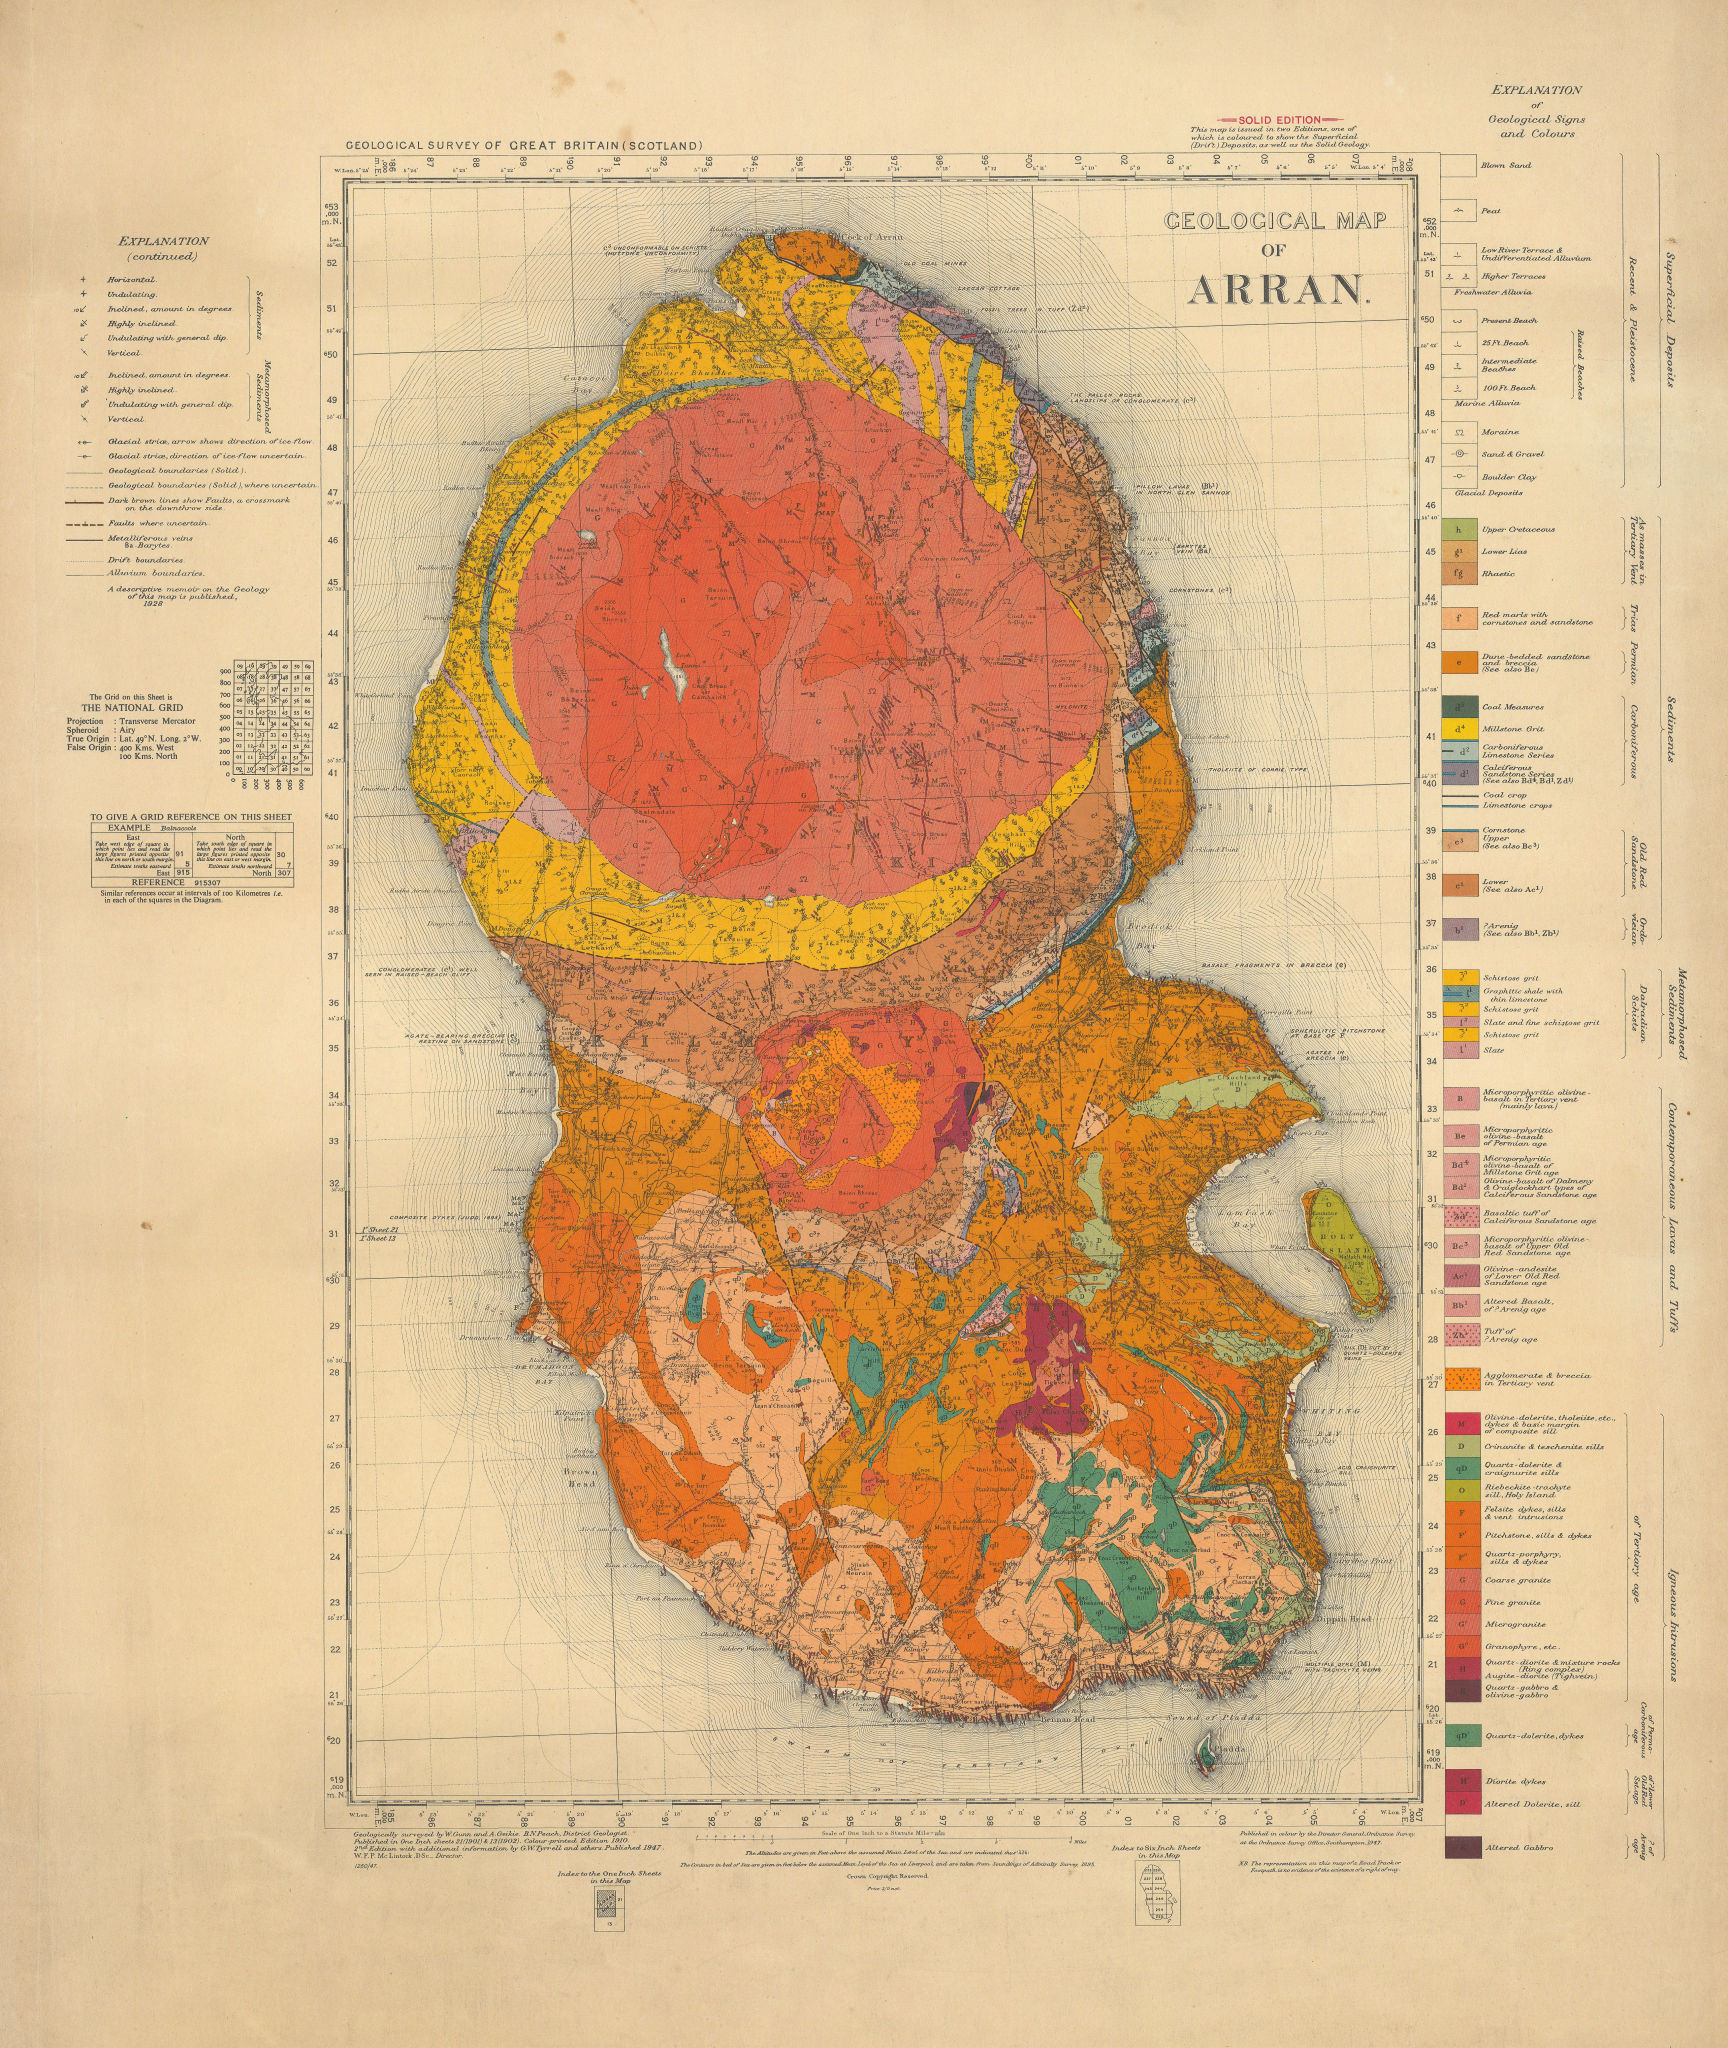 Geological map of Arran. Geological survey sheet. Scotland 1947 old